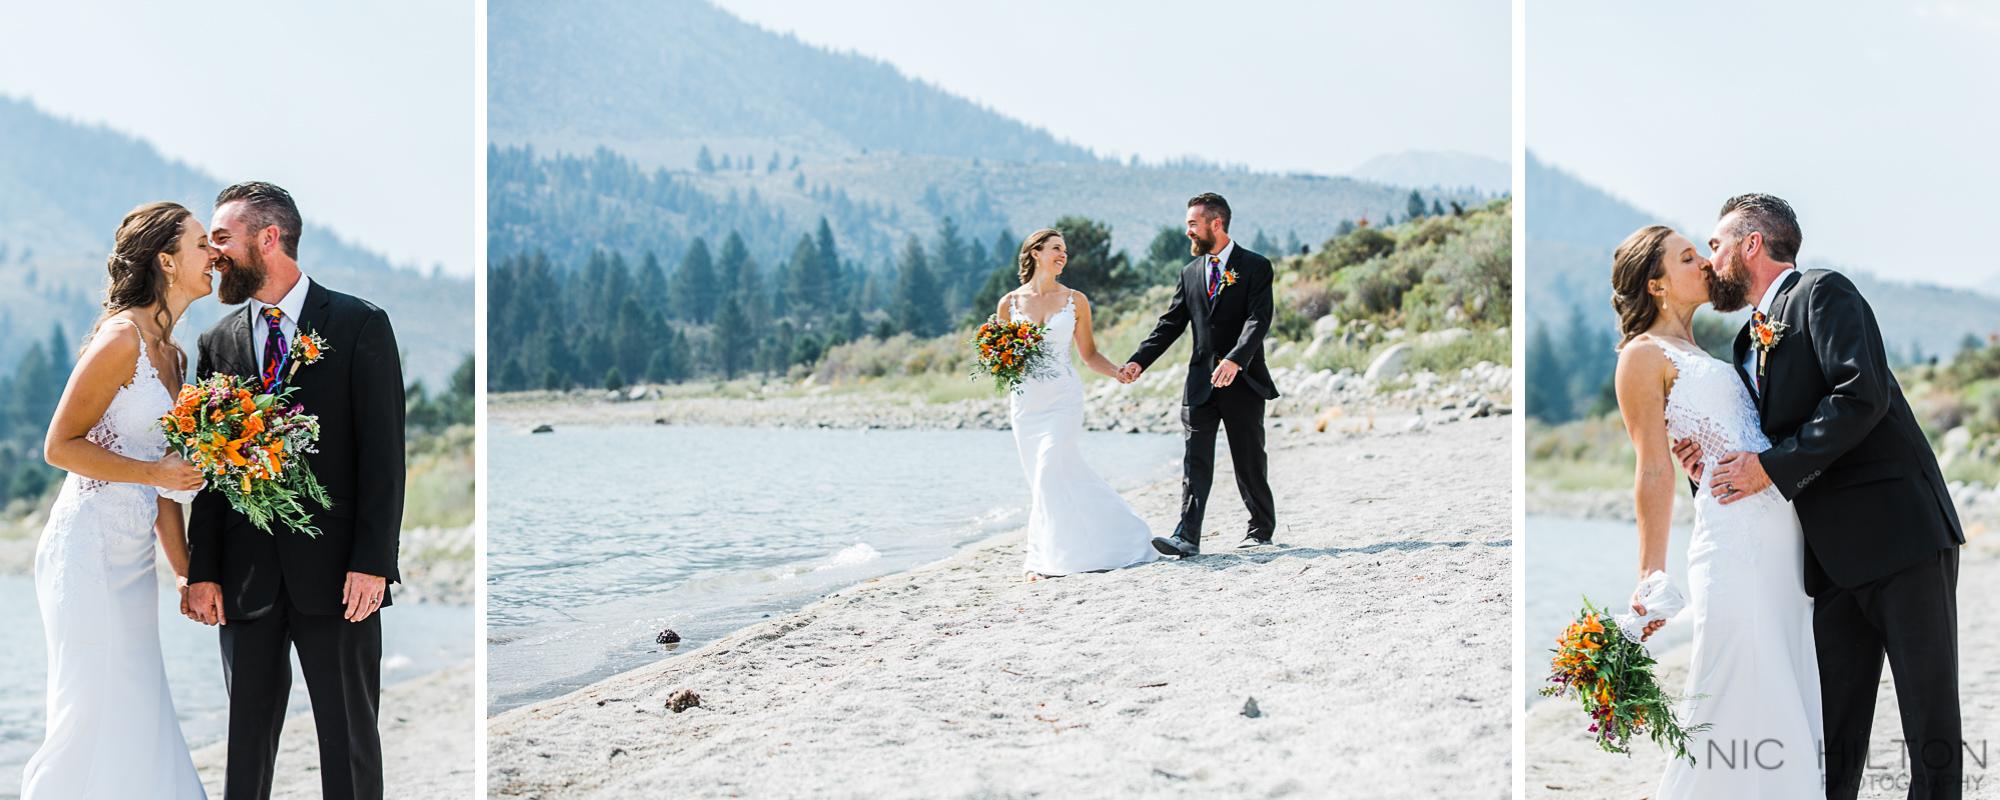 Bride-and-groom-june-lake-beach-wedding-photography.jpg